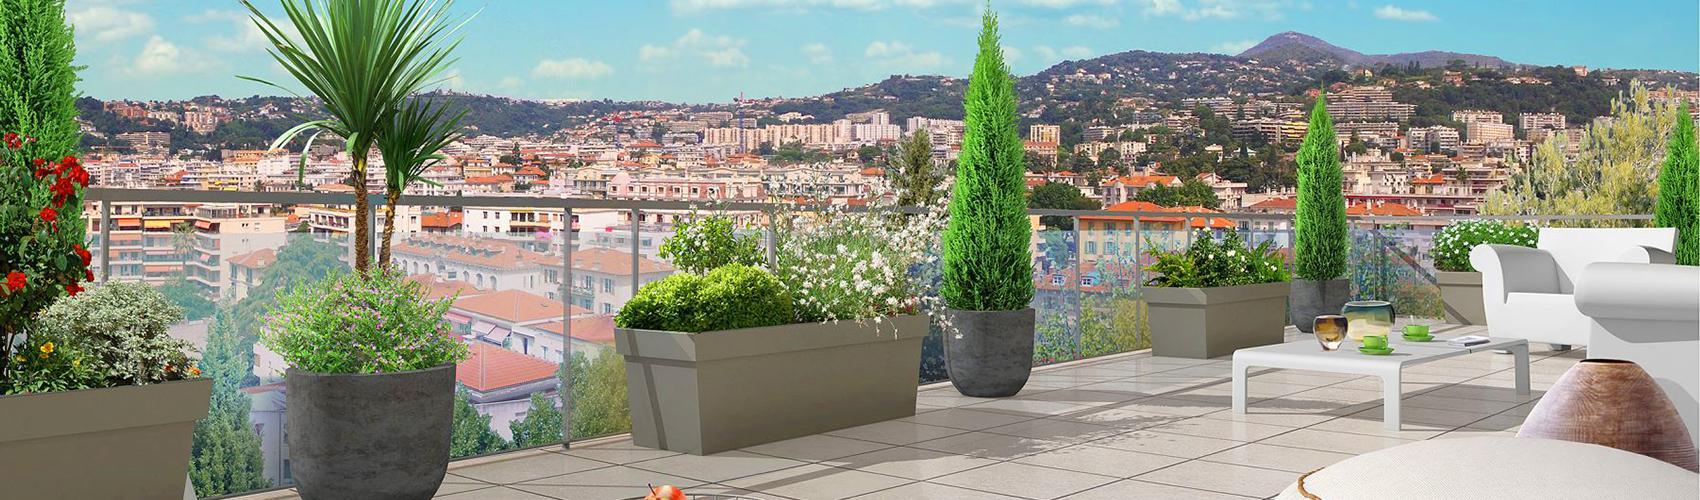 Photo du programme immobilier neuf NIC-2483 à Nice